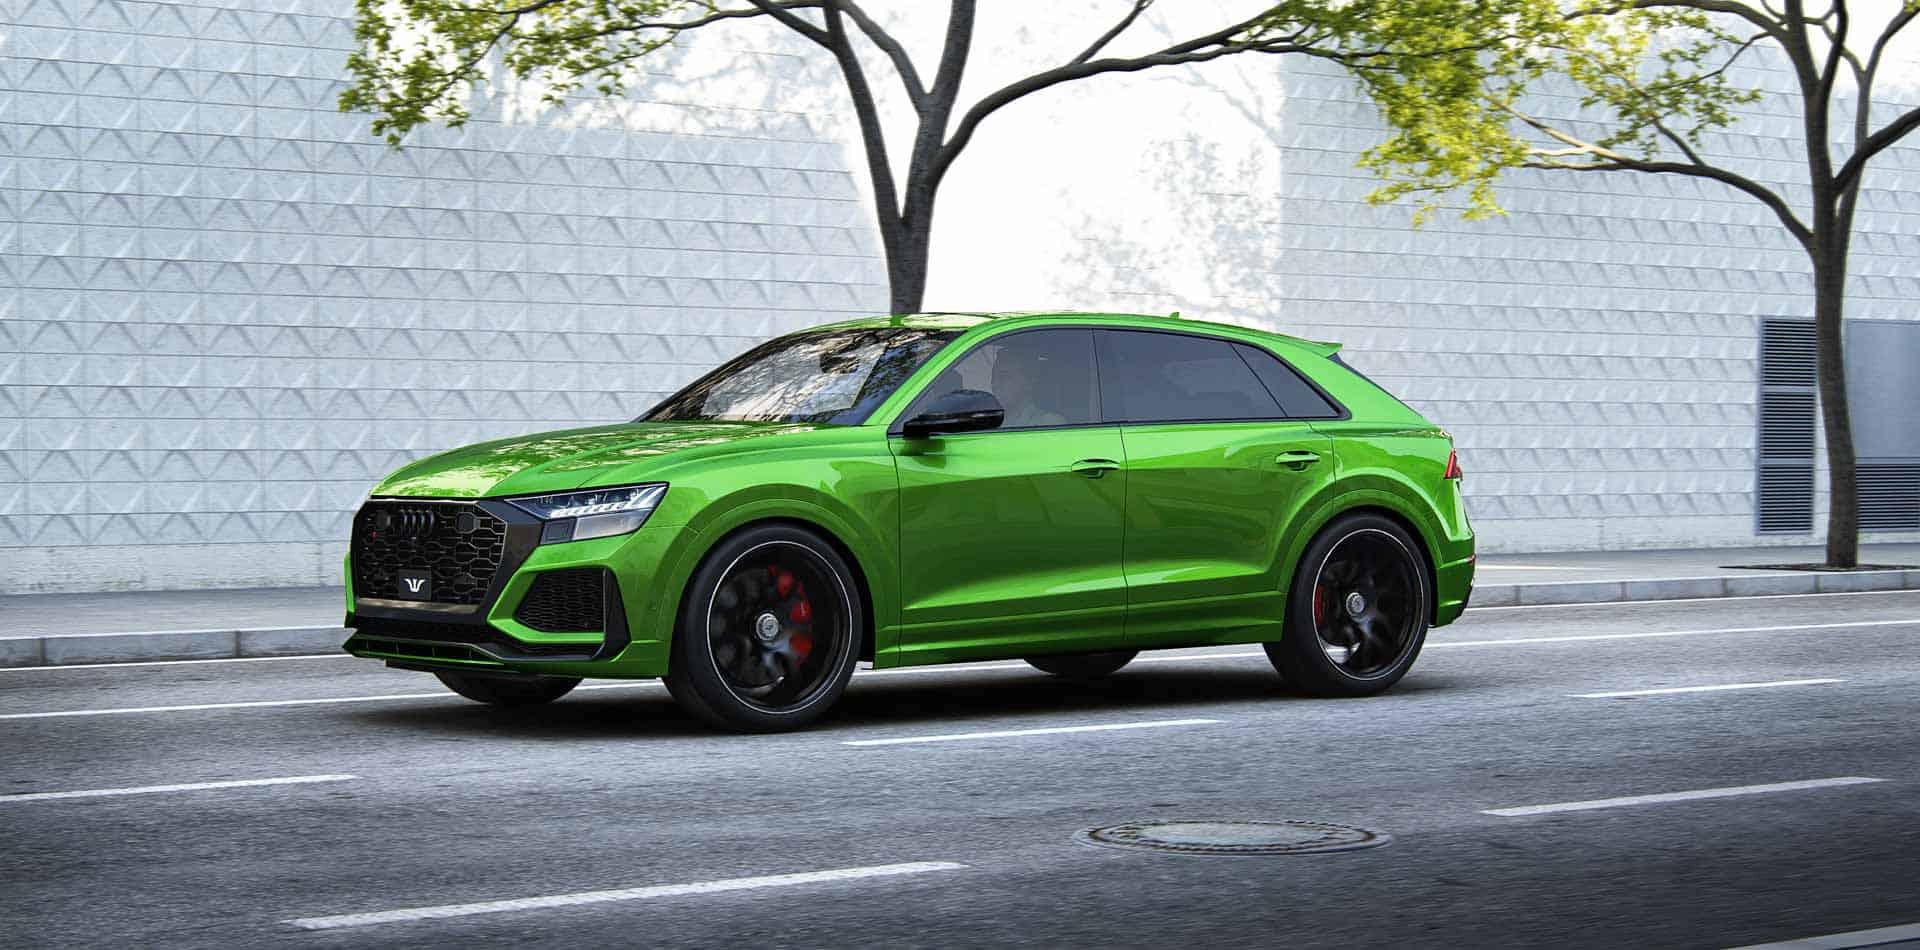 Audi-RS-Q8-by-Wheelsandmore-2